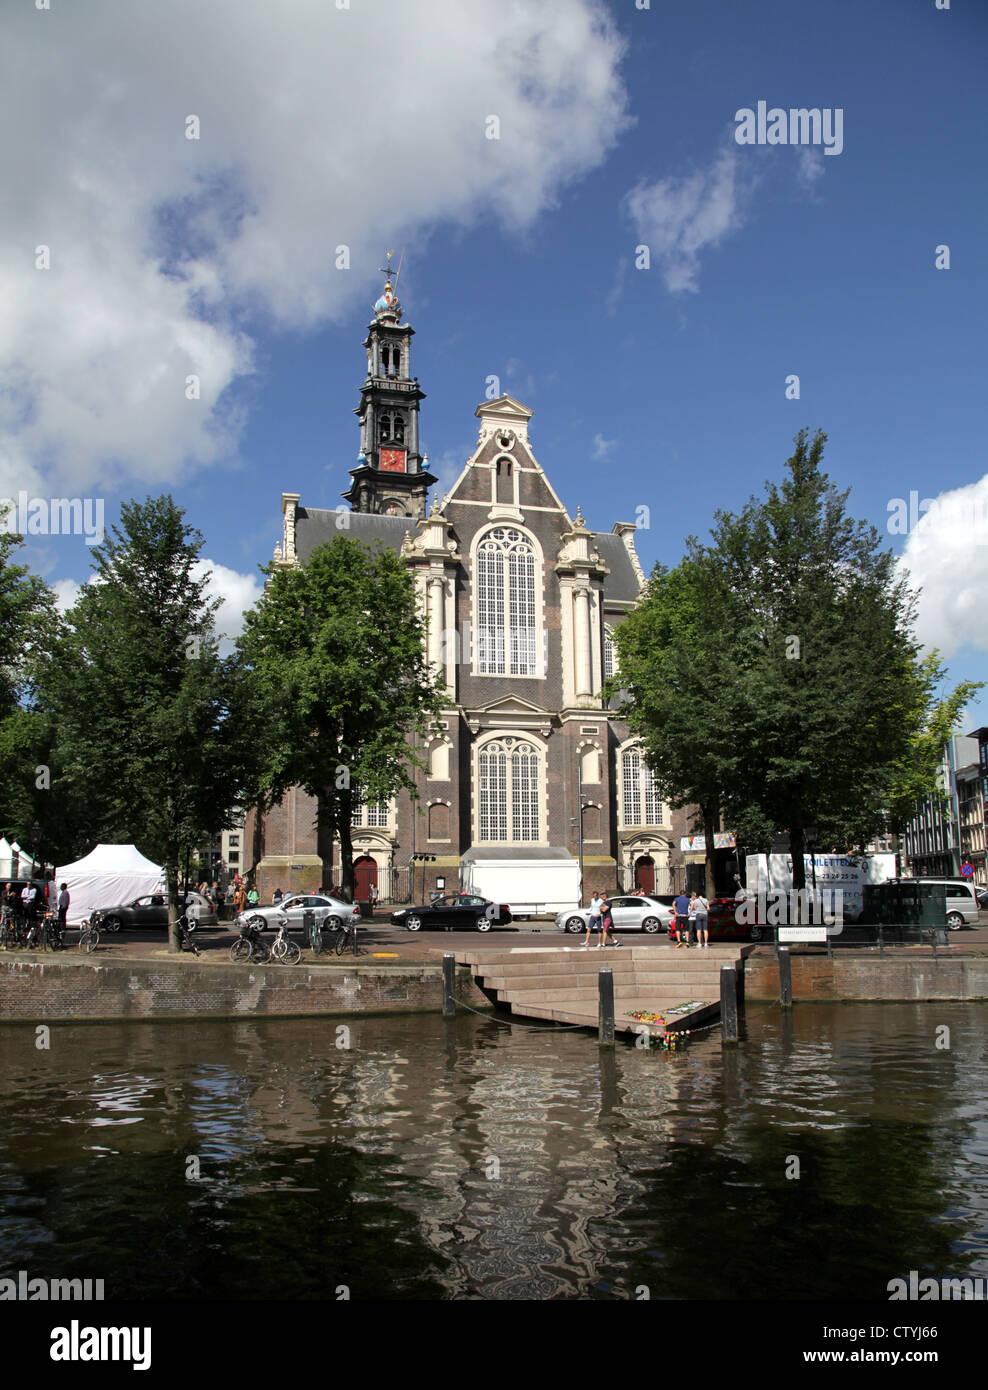 Amsterdam.Wester chiesa.Westerkerk.canali.Homomonument. Immagini Stock